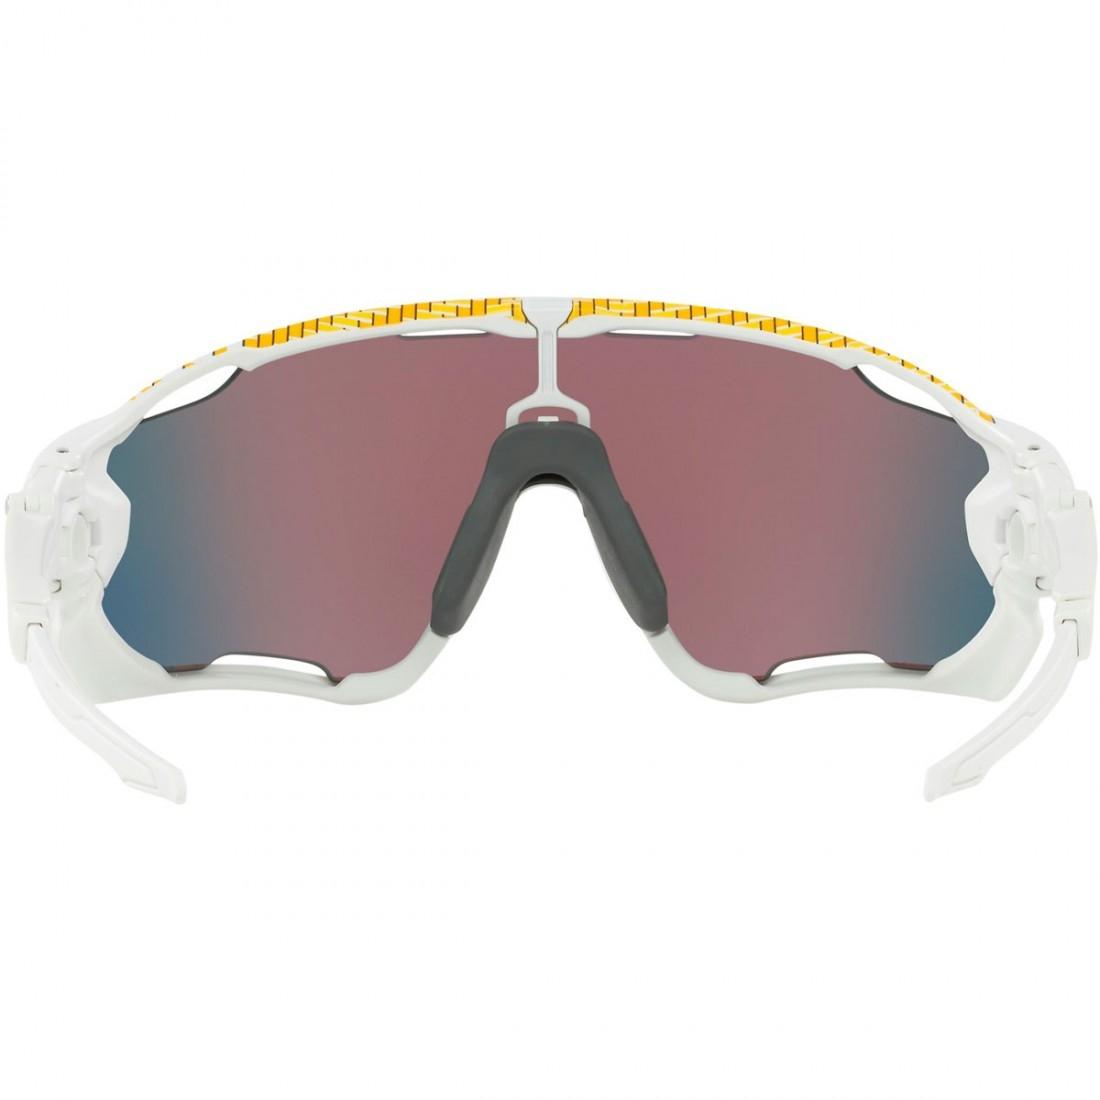 72bc7eb9b4 OAKLEY Jawbreaker Tour de France Matte White   Prizm Road Mask   Goggle